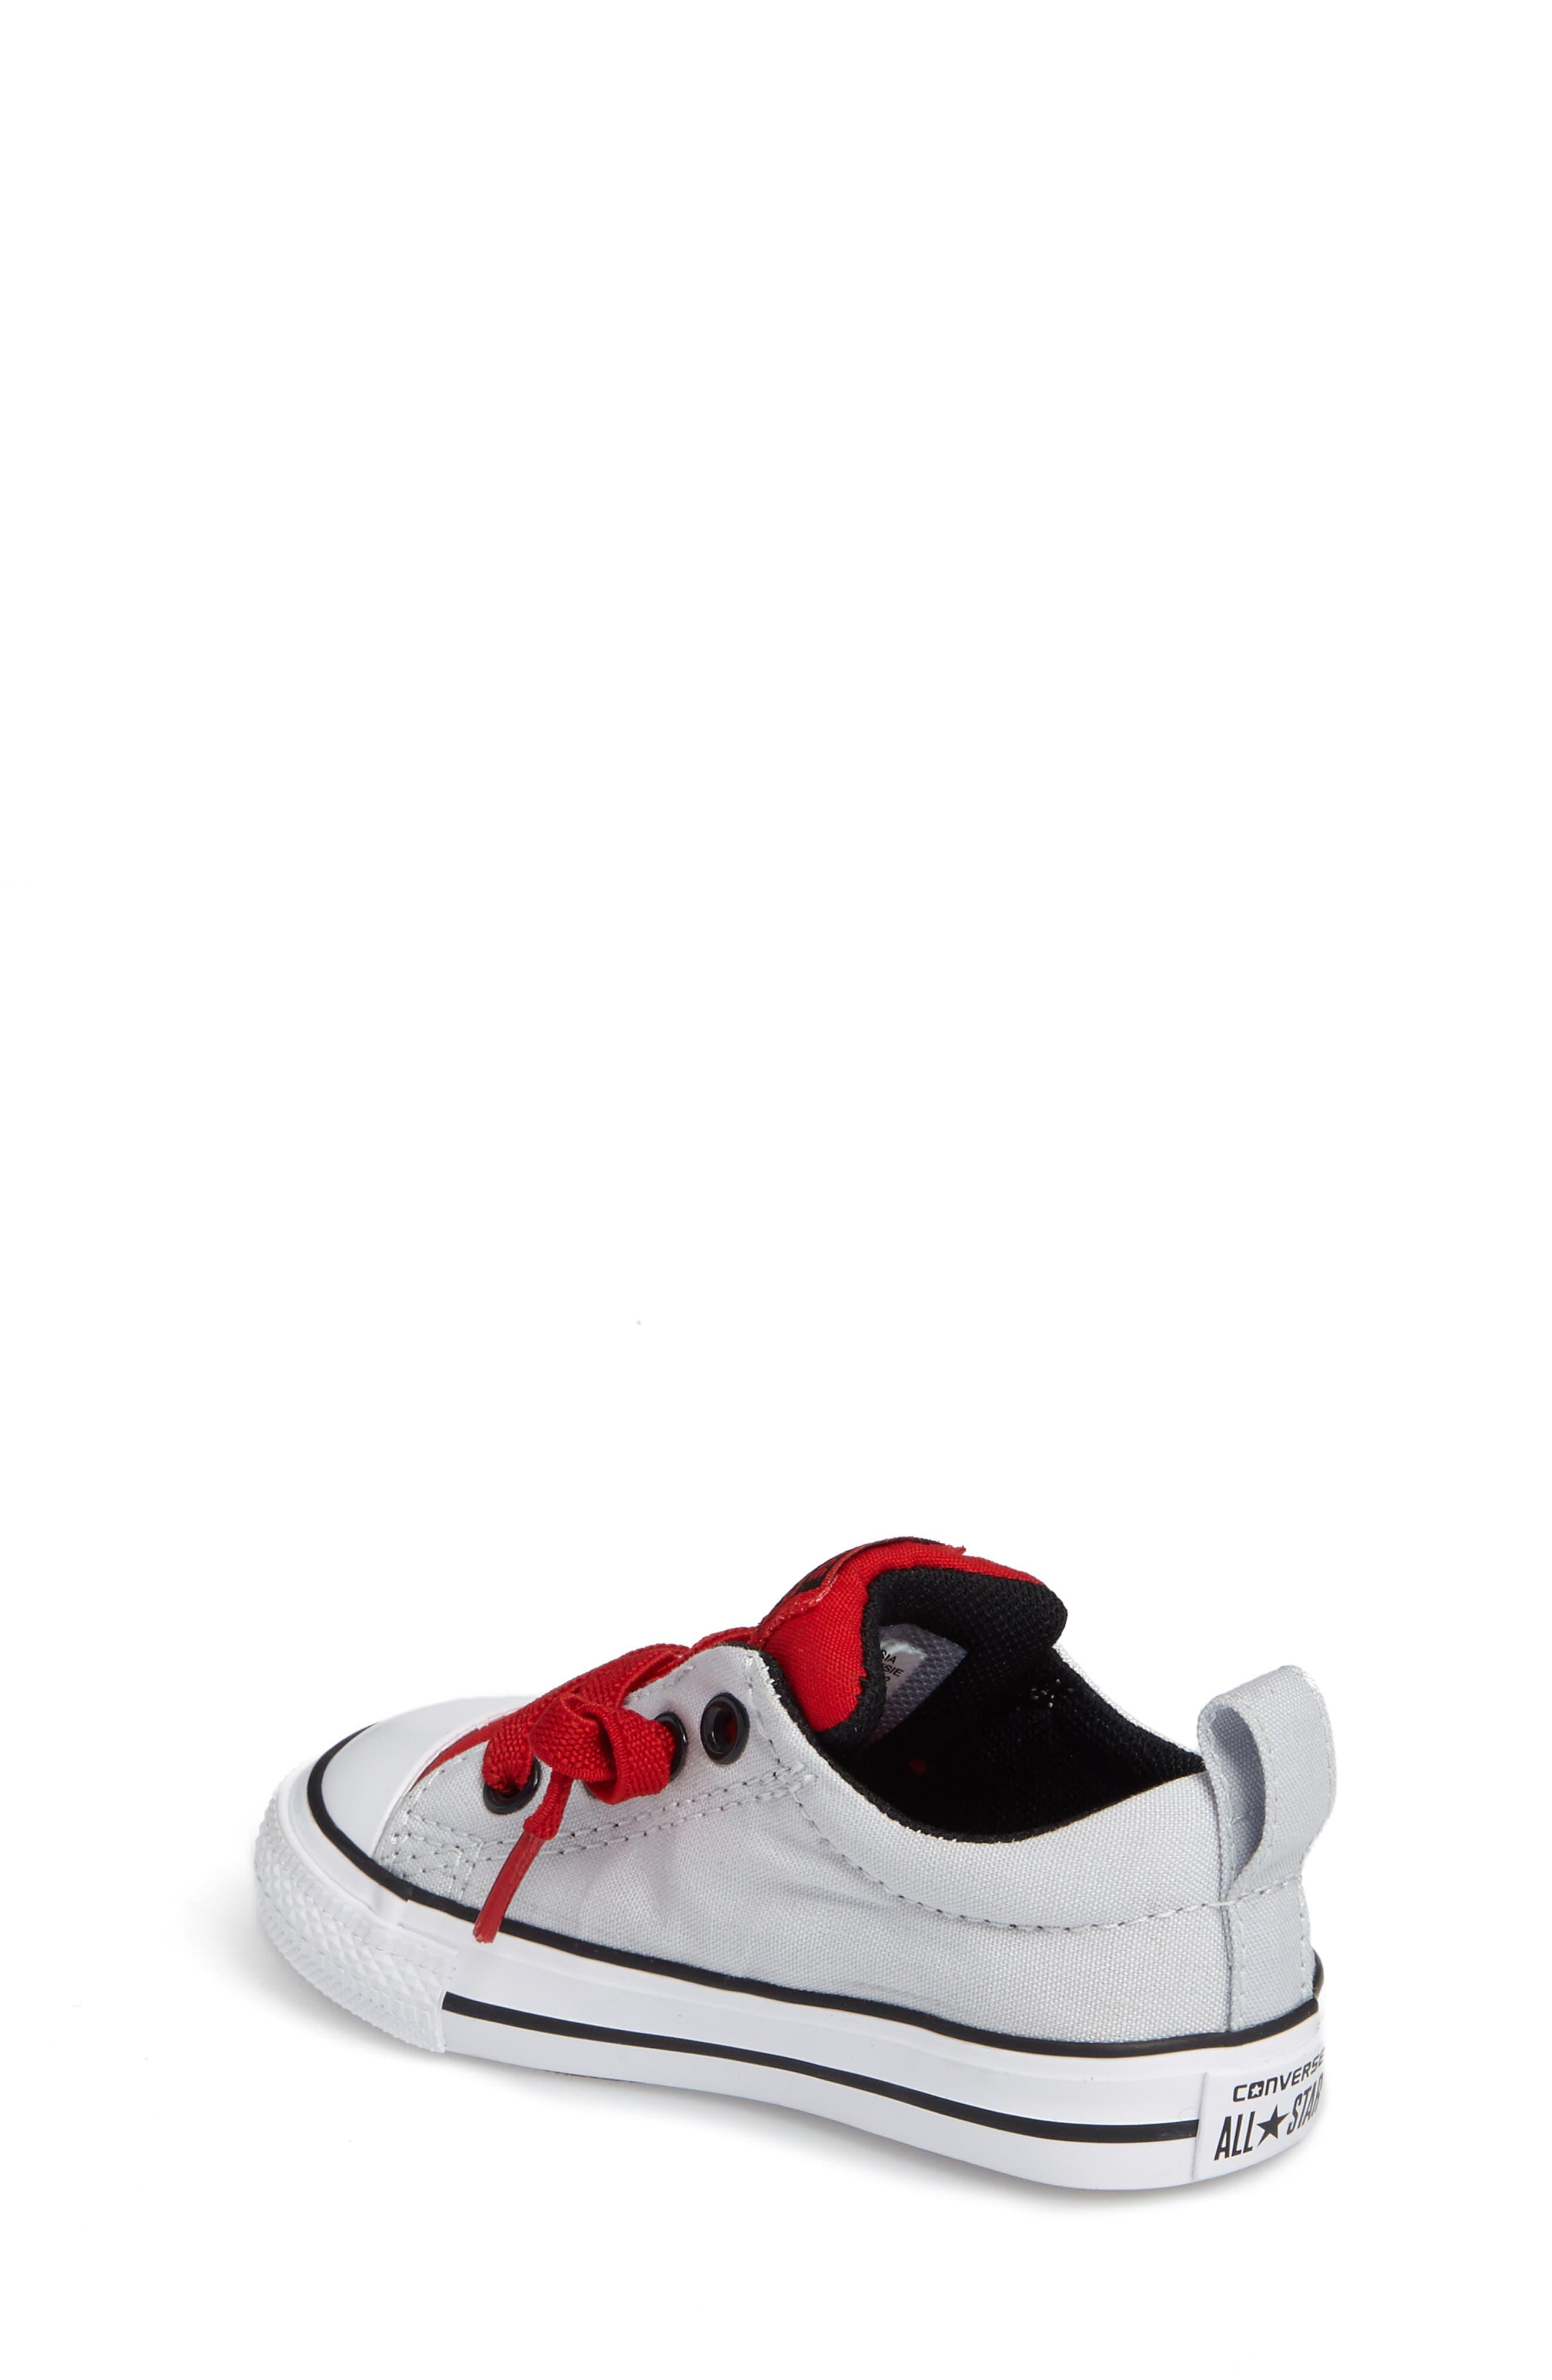 All Star<sup>®</sup> Street Slip Low Top Sneaker,                             Alternate thumbnail 2, color,                             040